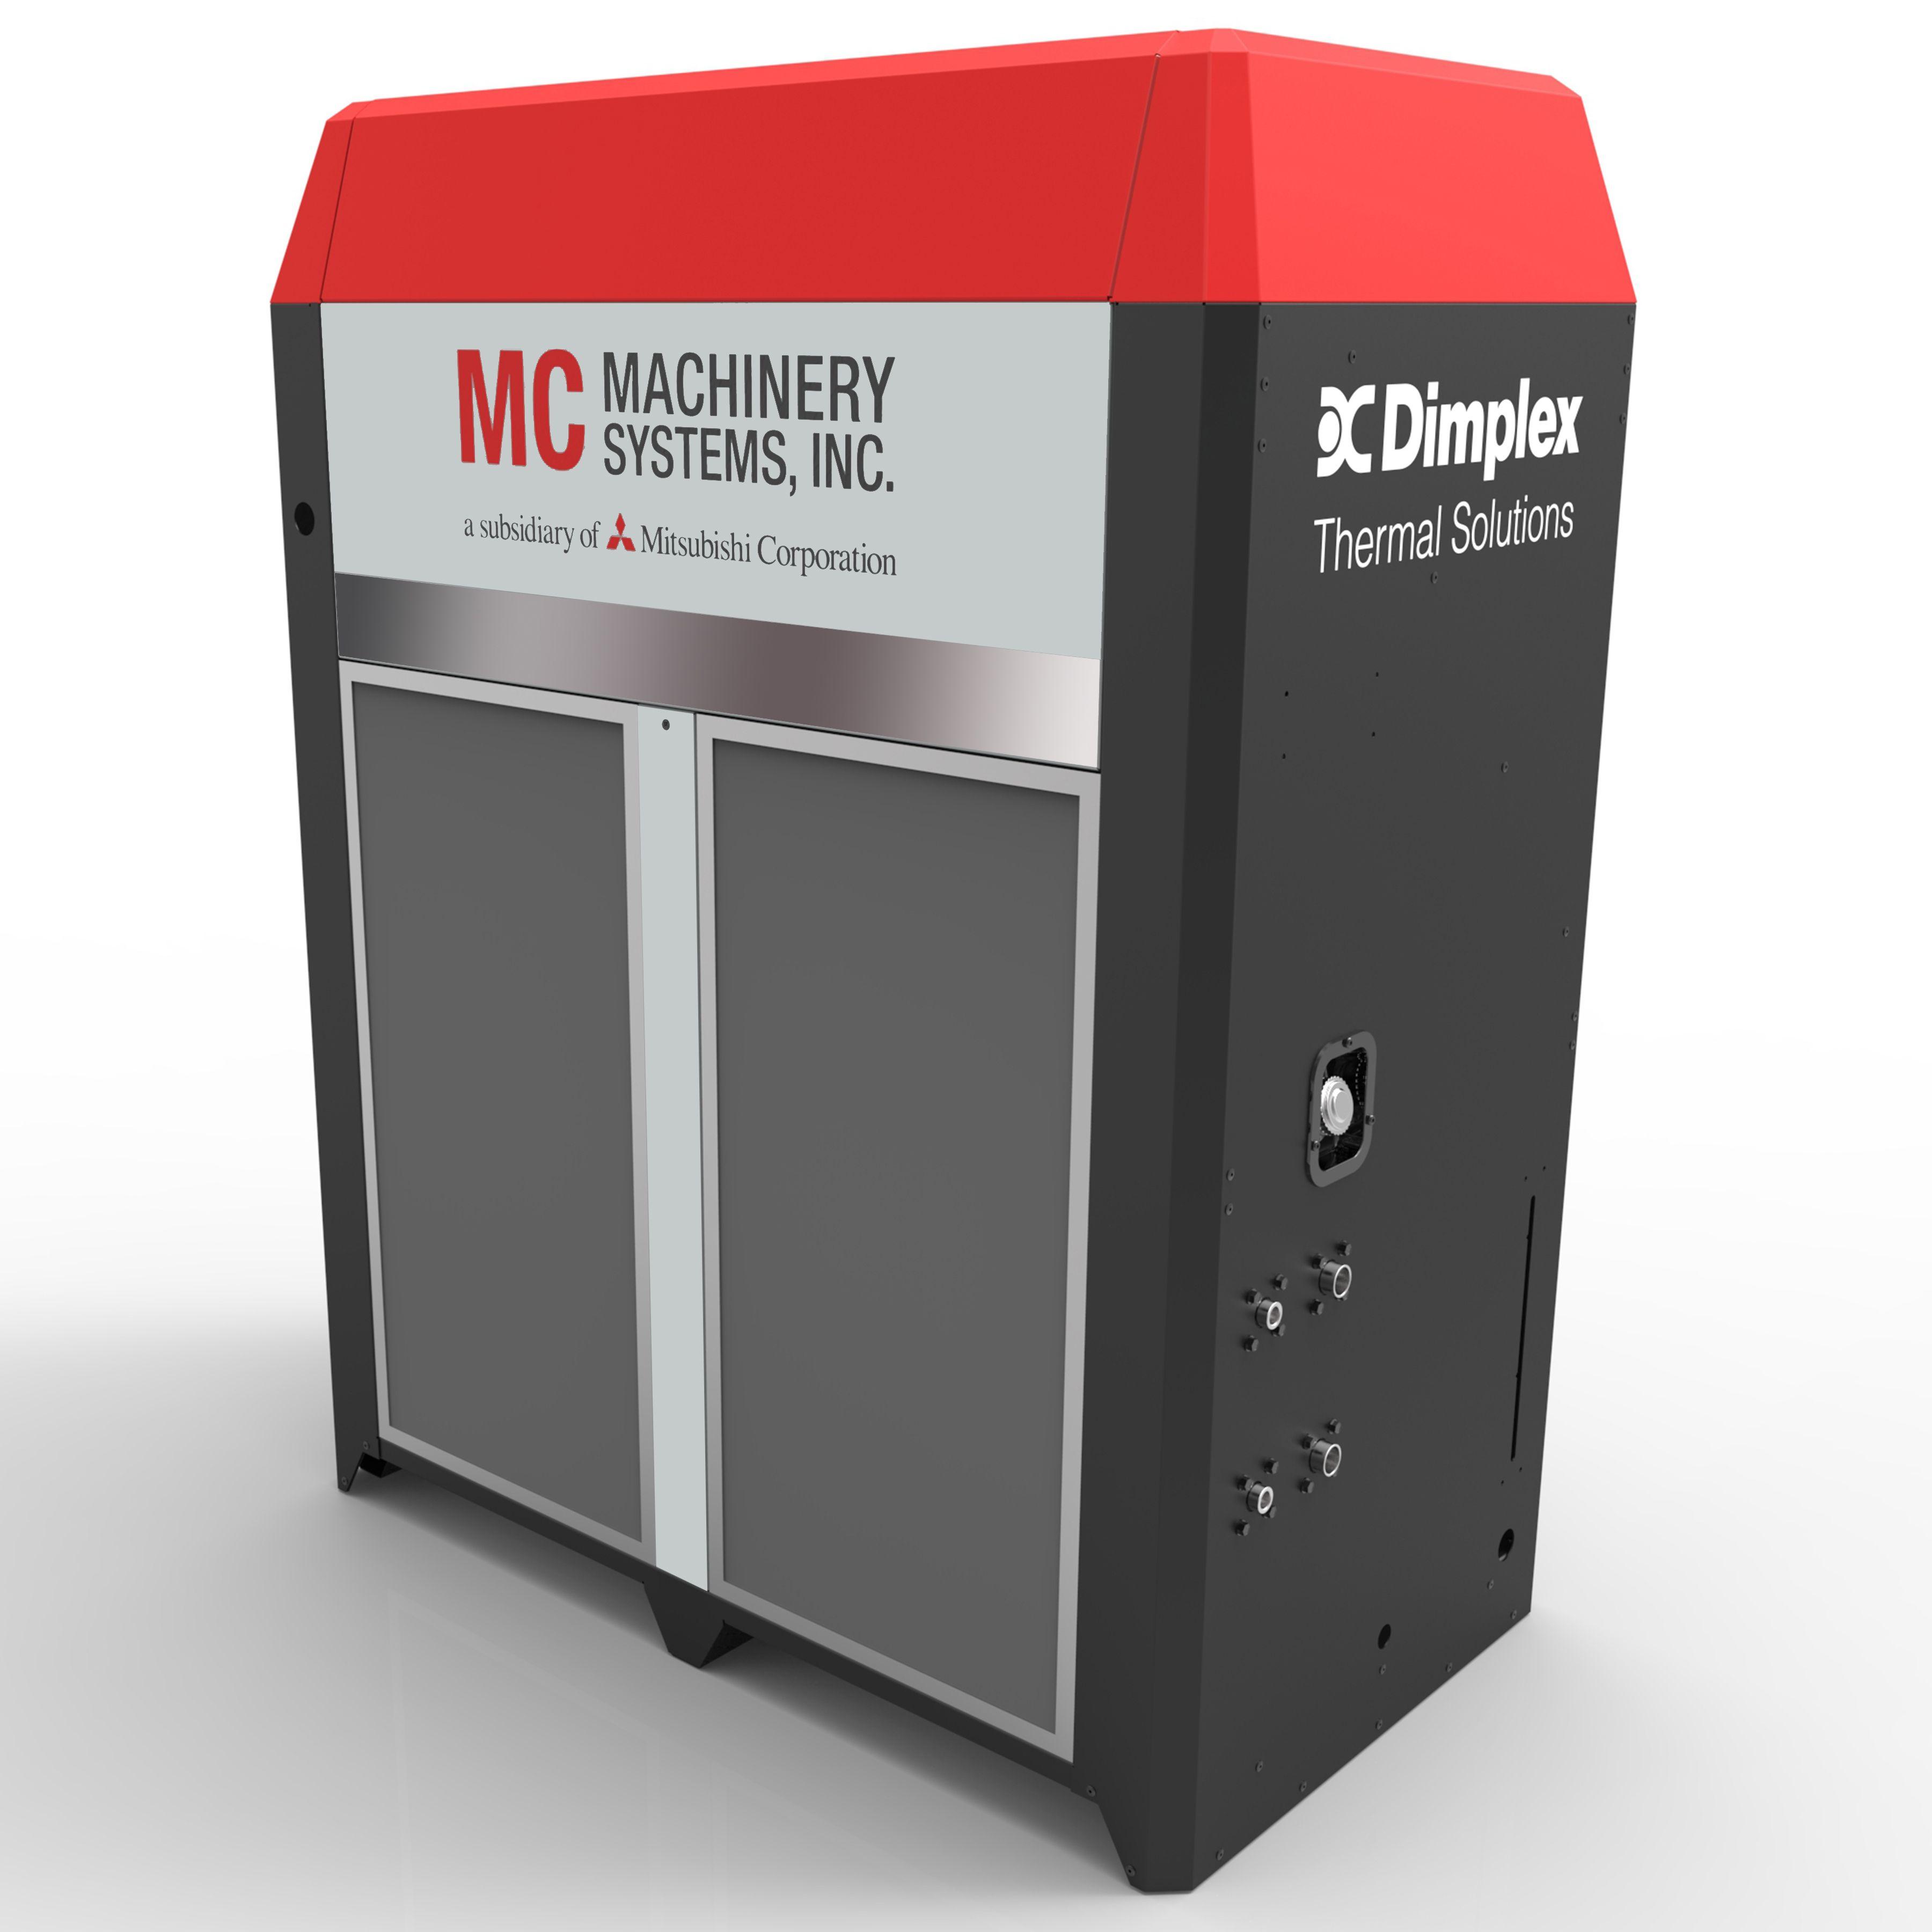 Dimplex thermal solutions 20 ton chiller design 2 locker